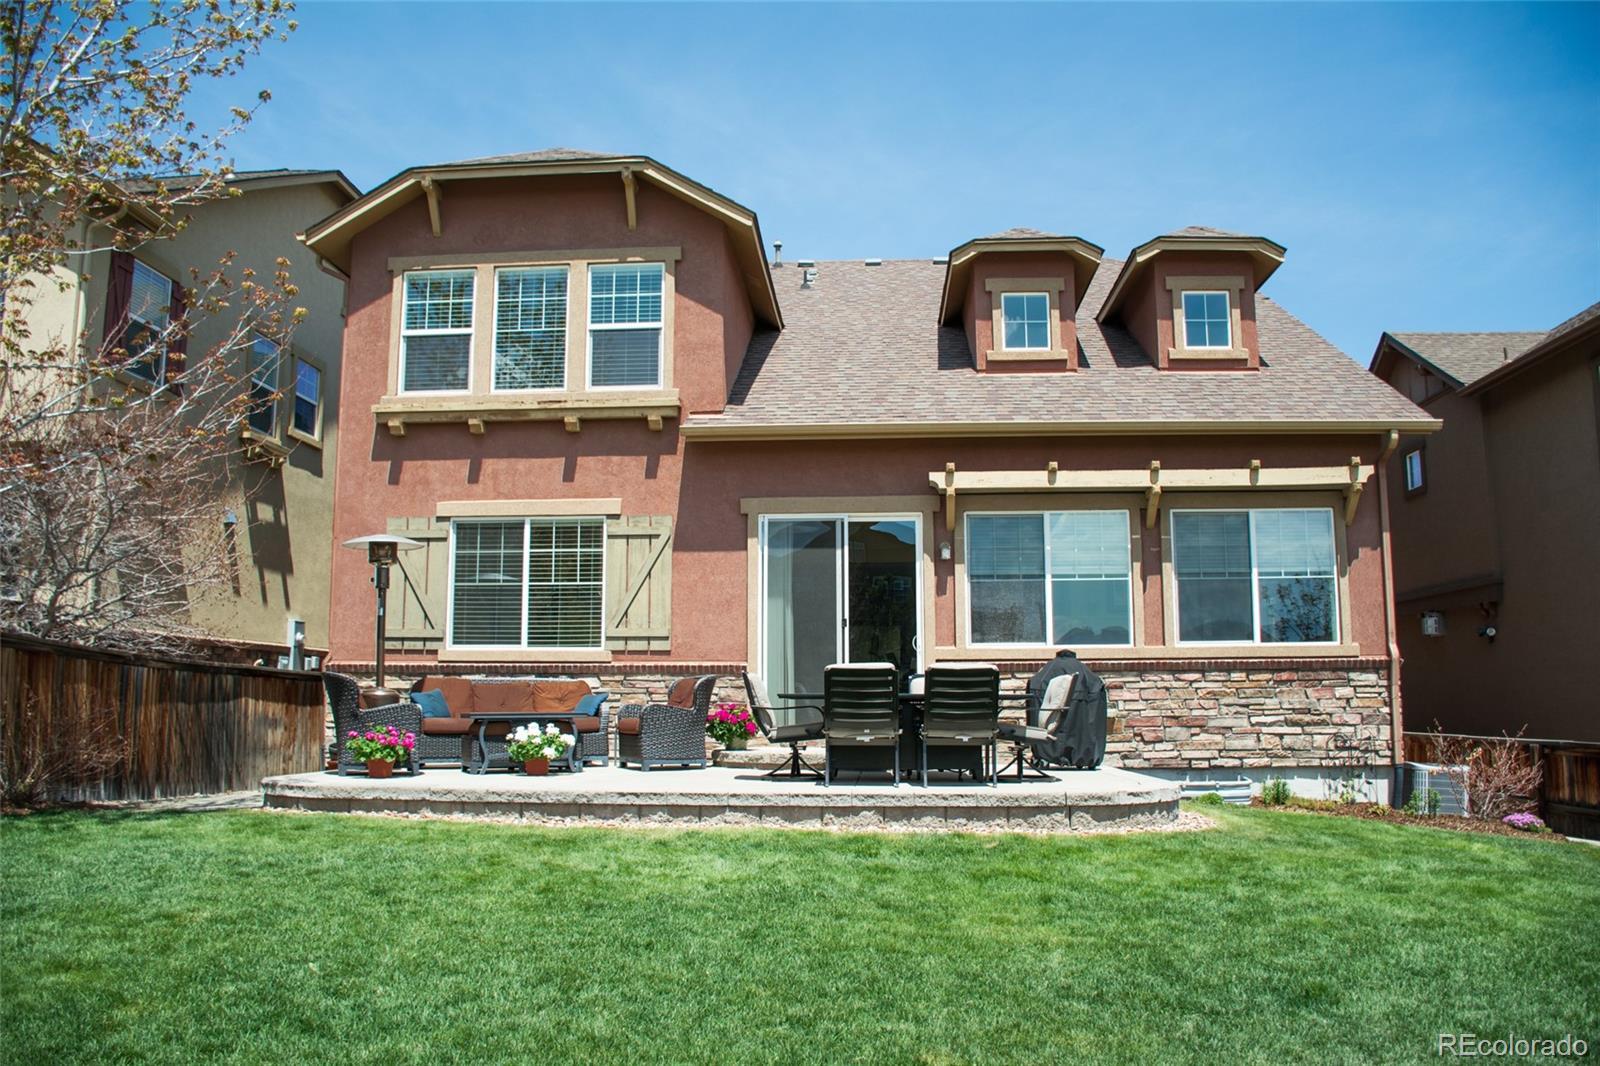 MLS# 6747511 - 27 - 4568 Valleybrook Drive, Highlands Ranch, CO 80130